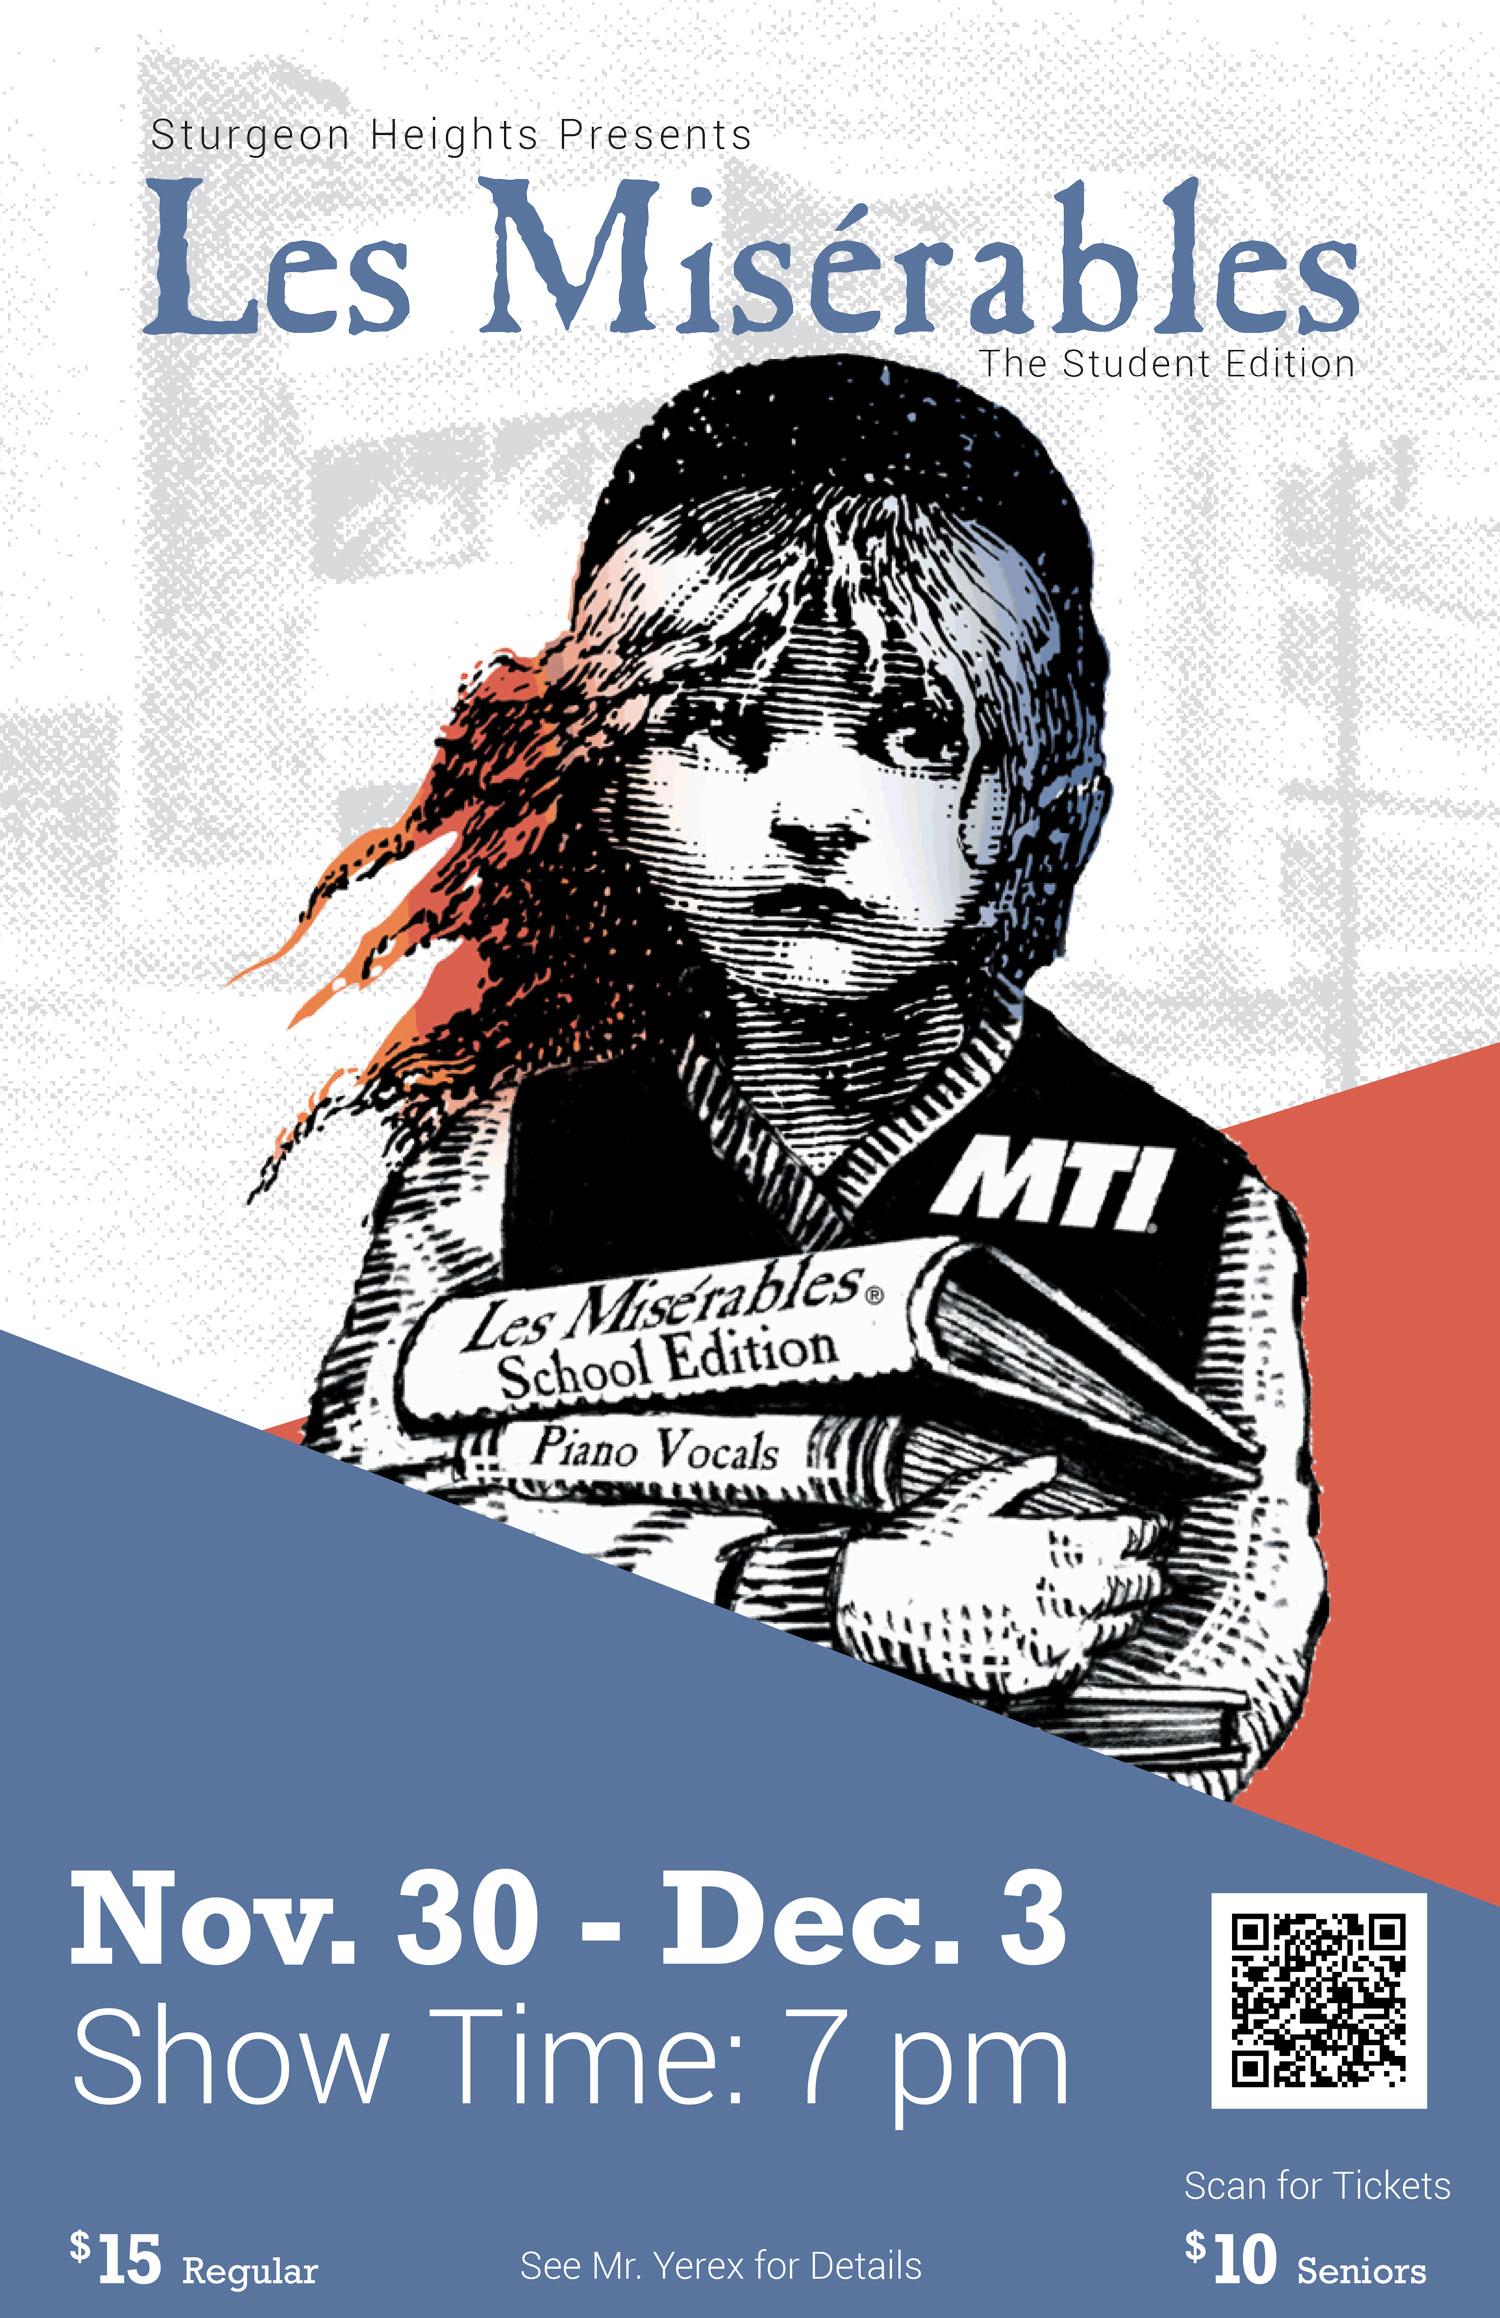 Les Misérables - School Edition performed by Sturgeon Heights Collegiate, Winnipeg